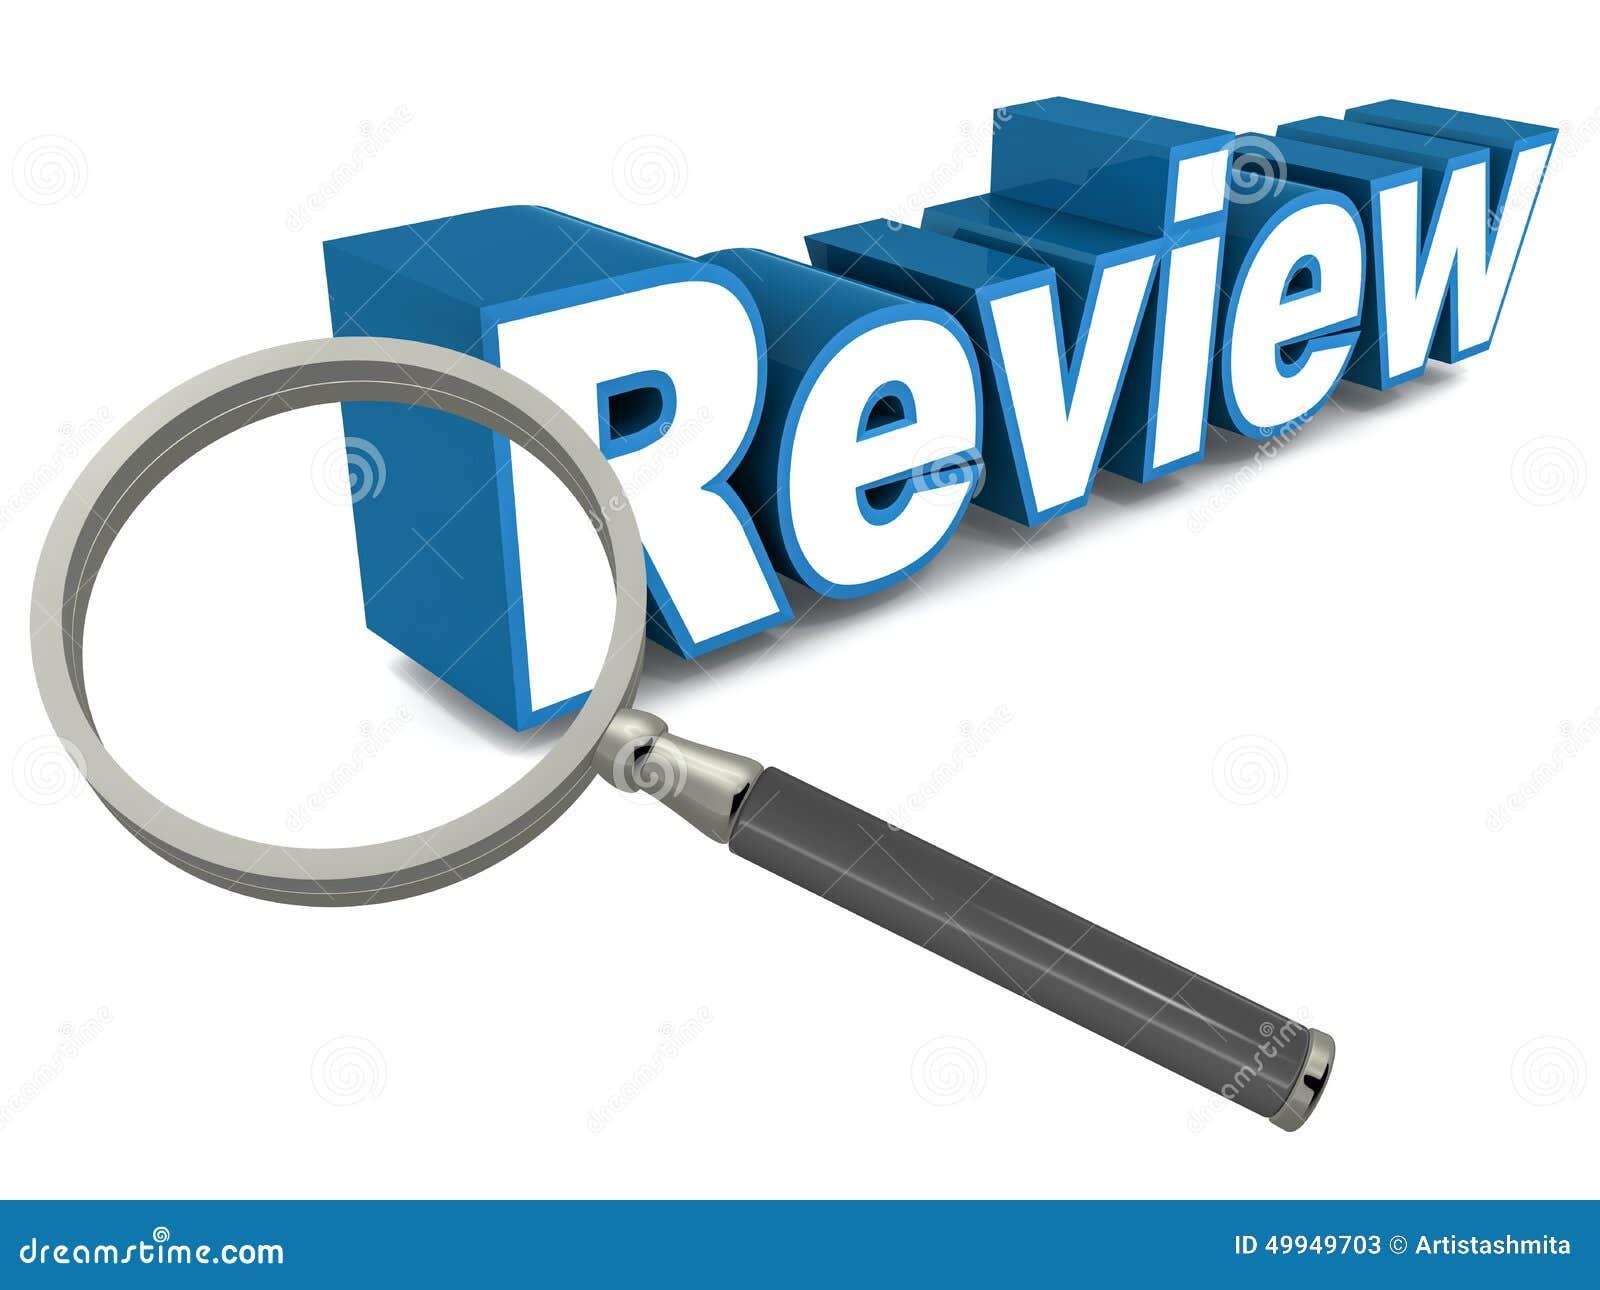 Opinion & Reviews - Wall Street Journal - wsj.com